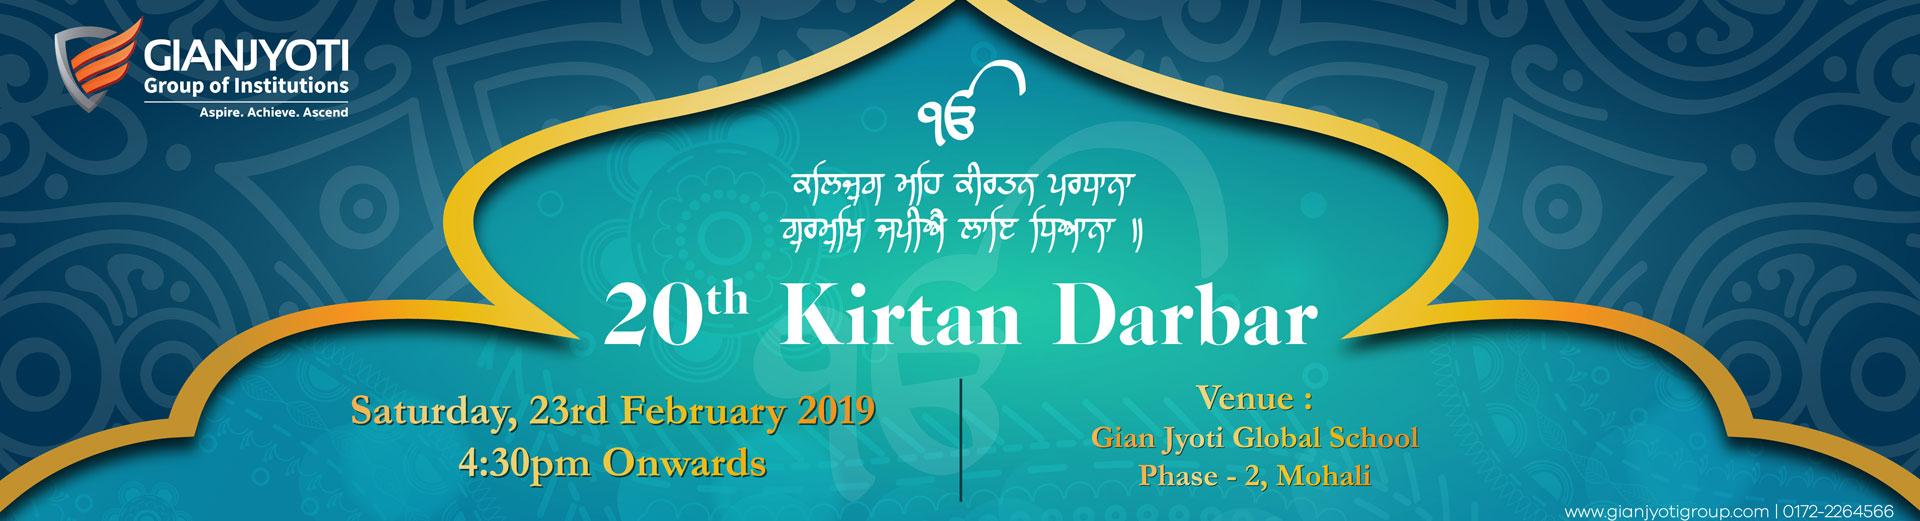 Kirtan-Darbar-Web-Banner-gjimt